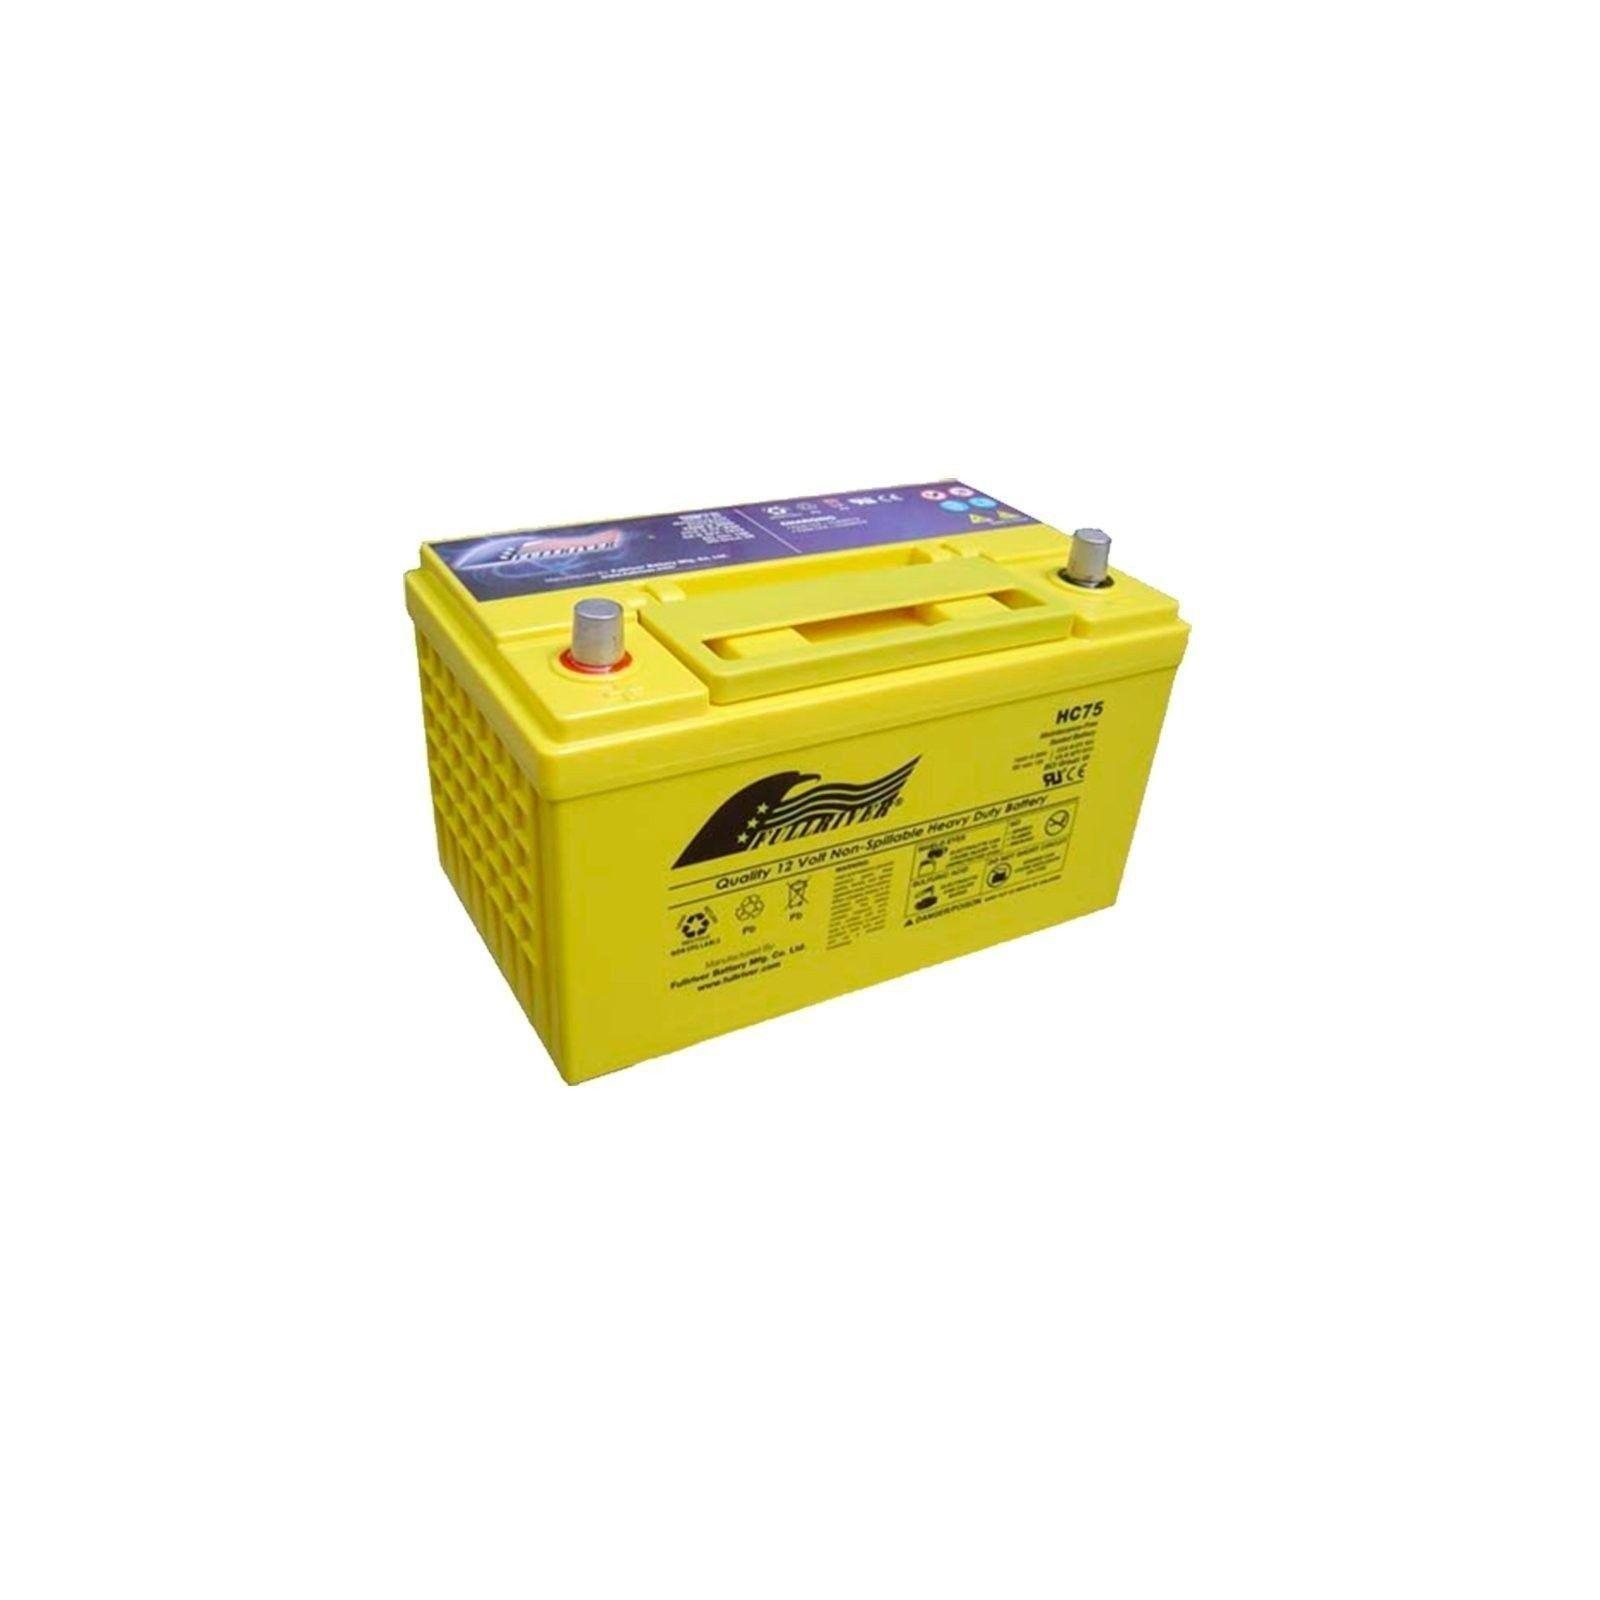 Batería Fullriver HC75X 75Ah 930A 12V Hc FULLRIVER - 1